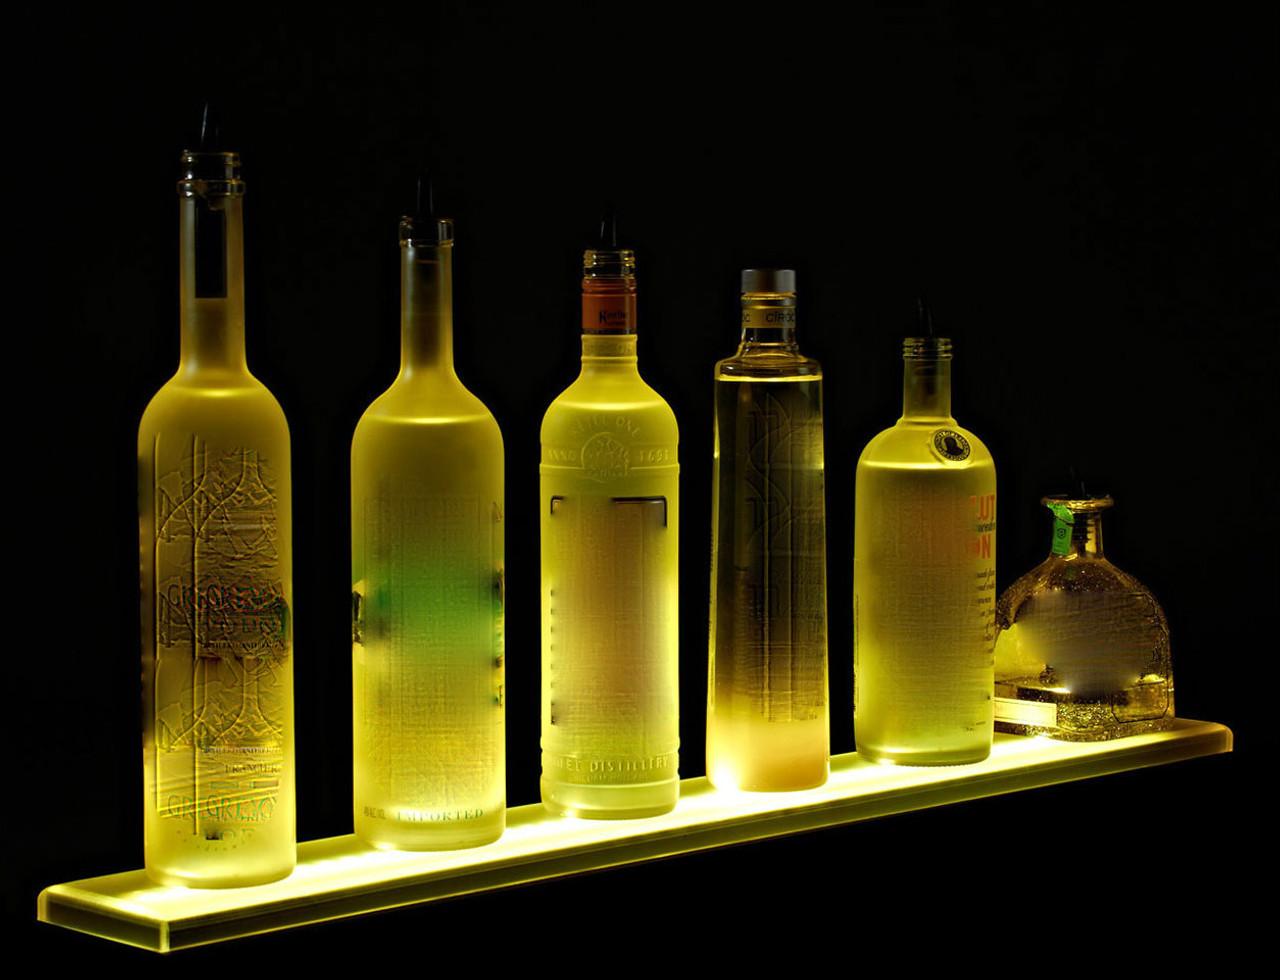 LED LIQUOR DISPLAY,LED, LIQUOR, DISPLAY,single, tier,flat, panel, bar, liquor, shelve,shelf,shelving, glorifier, light up, display, liquor shelf, liquor display